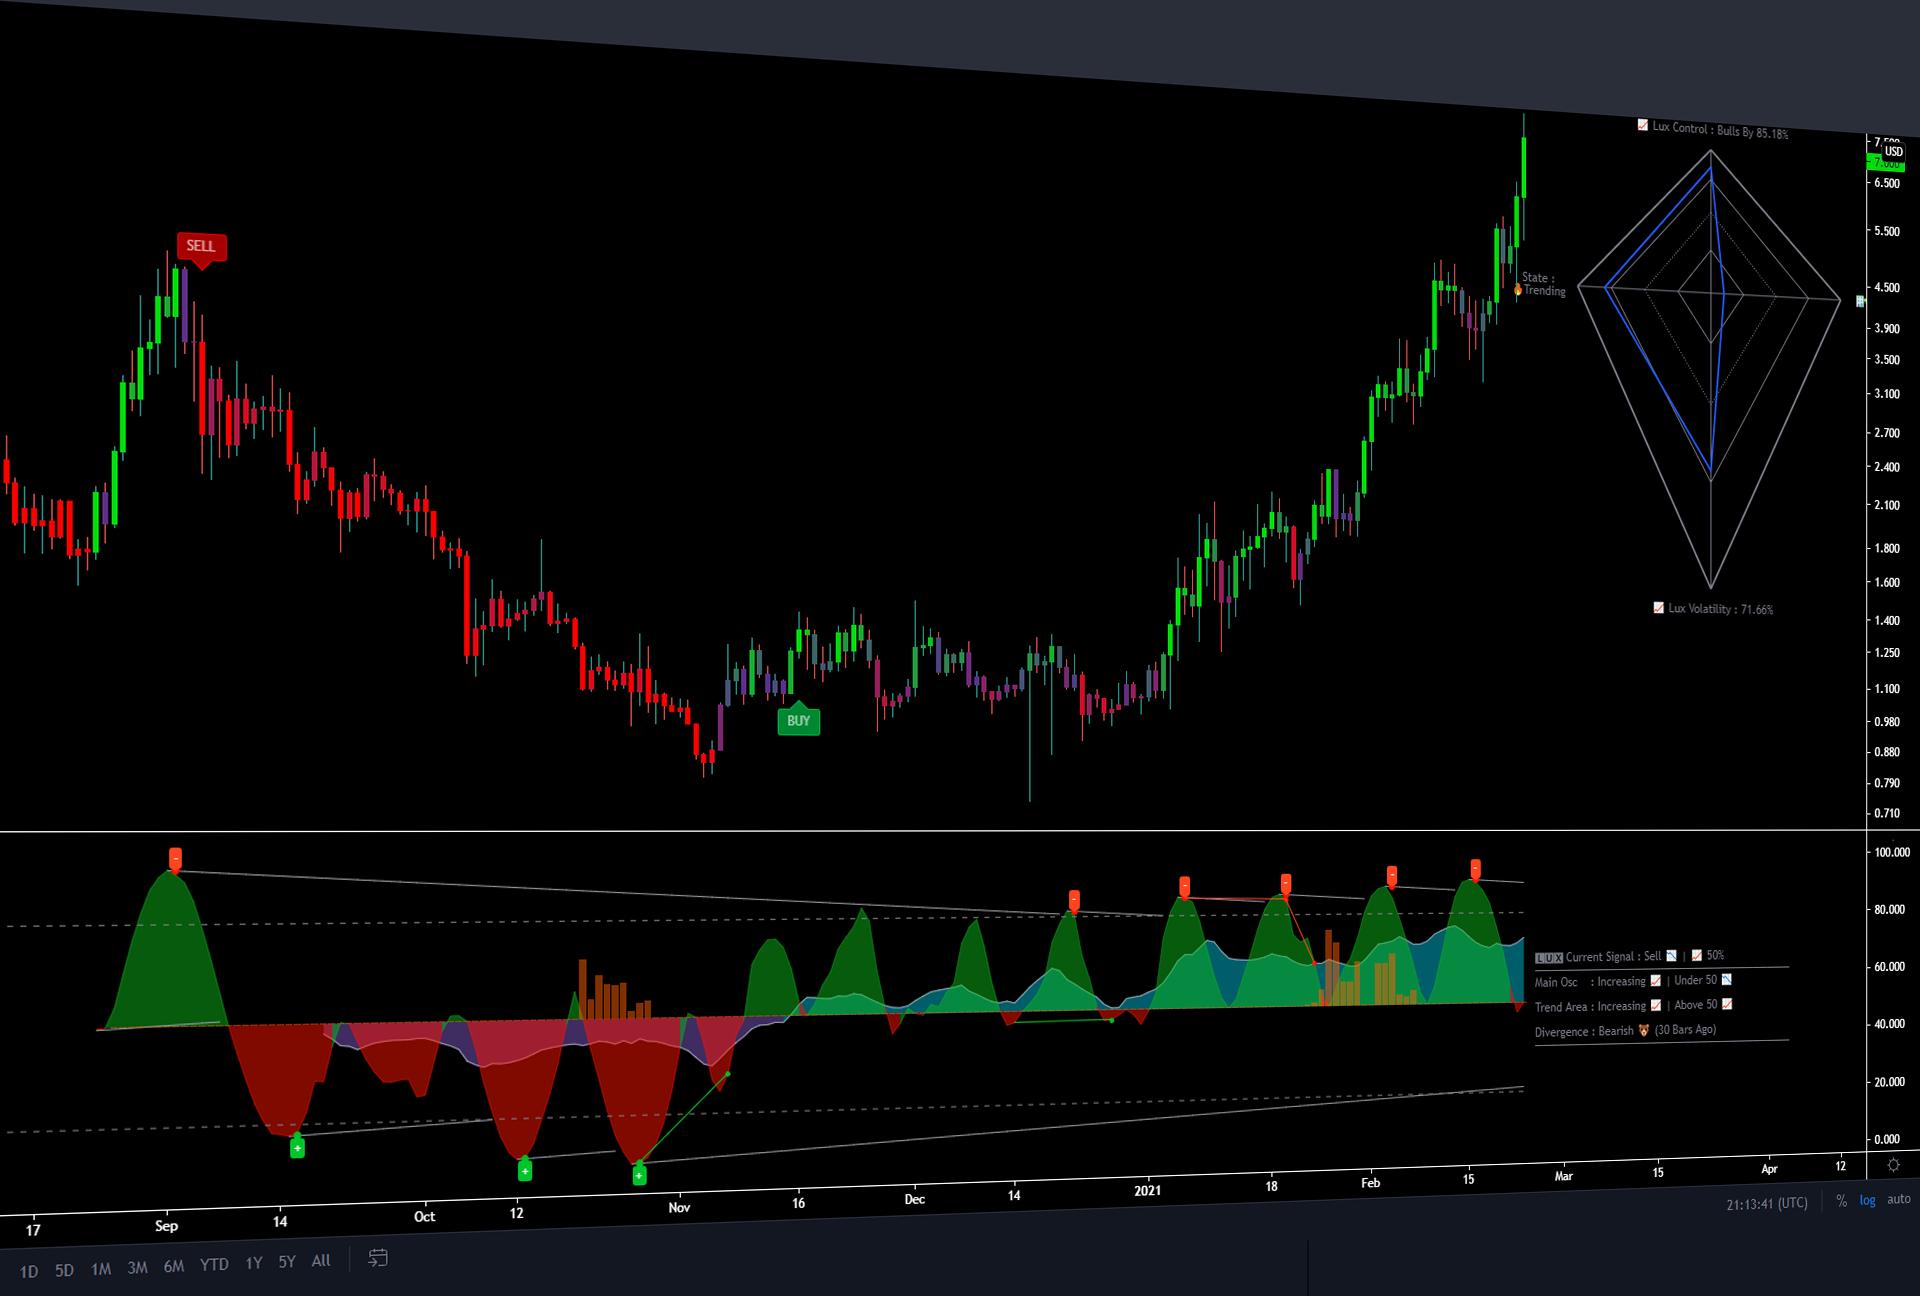 Lux Algo Premium suite example, buy and sell signals, trading algorithm, best TradingView indicators.